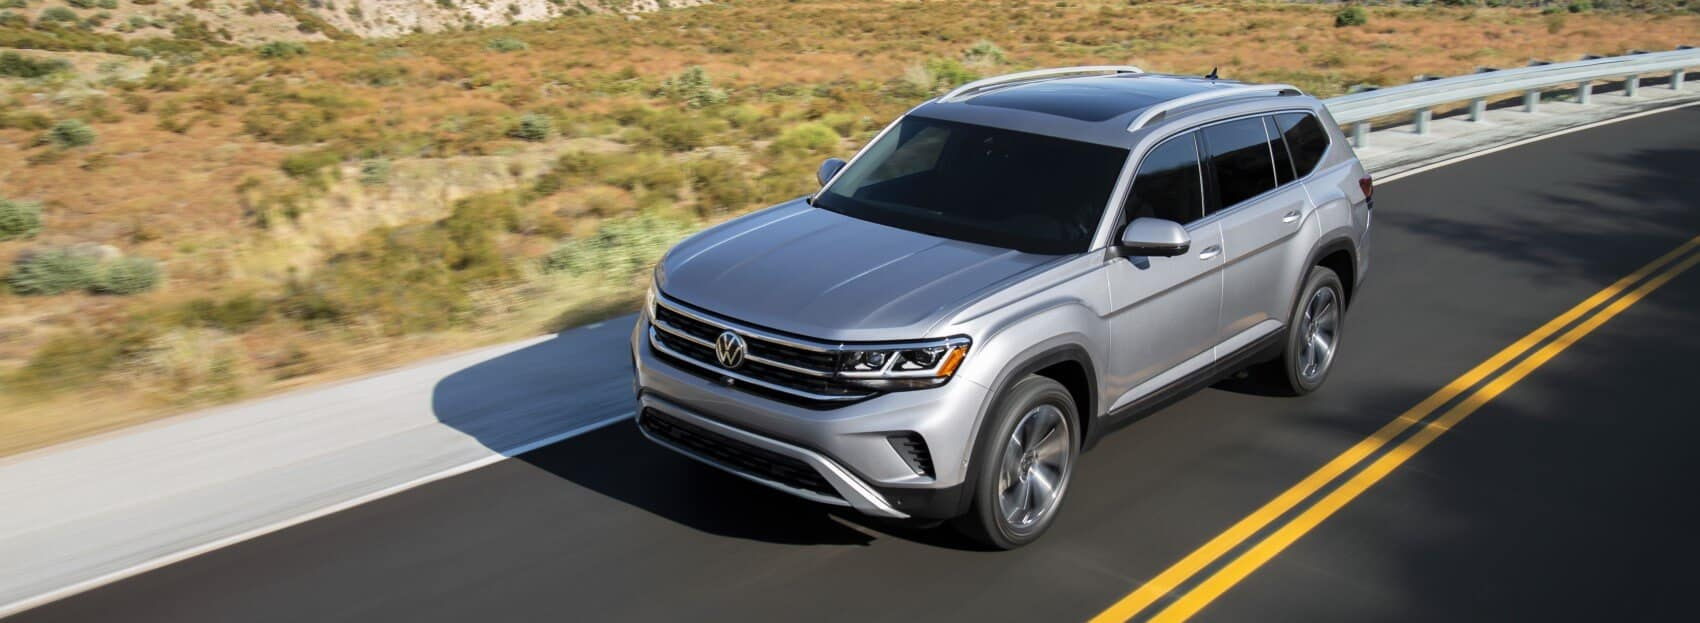 5-Star Overall Safety Rating Award: Volkswagen Atlas and VW Atlas Cross Sport